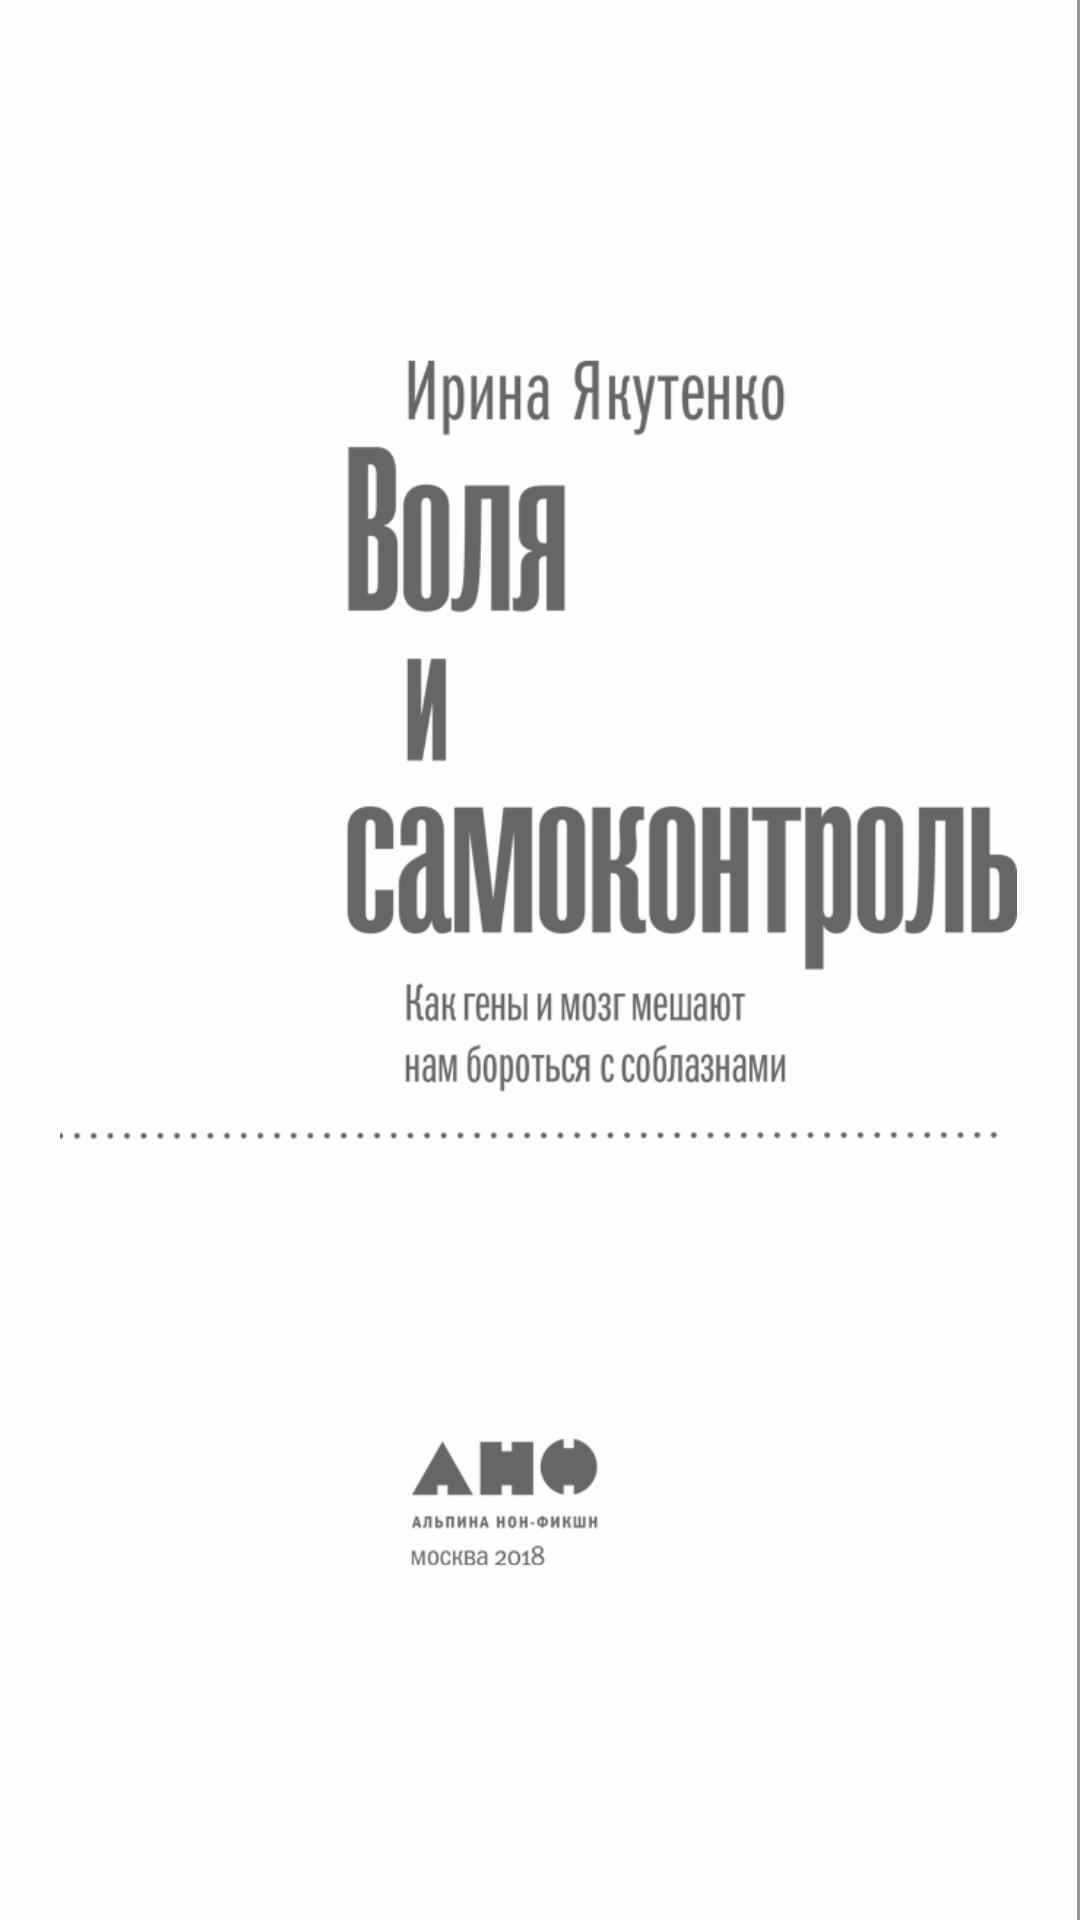 http://s7.uploads.ru/BwpOs.png